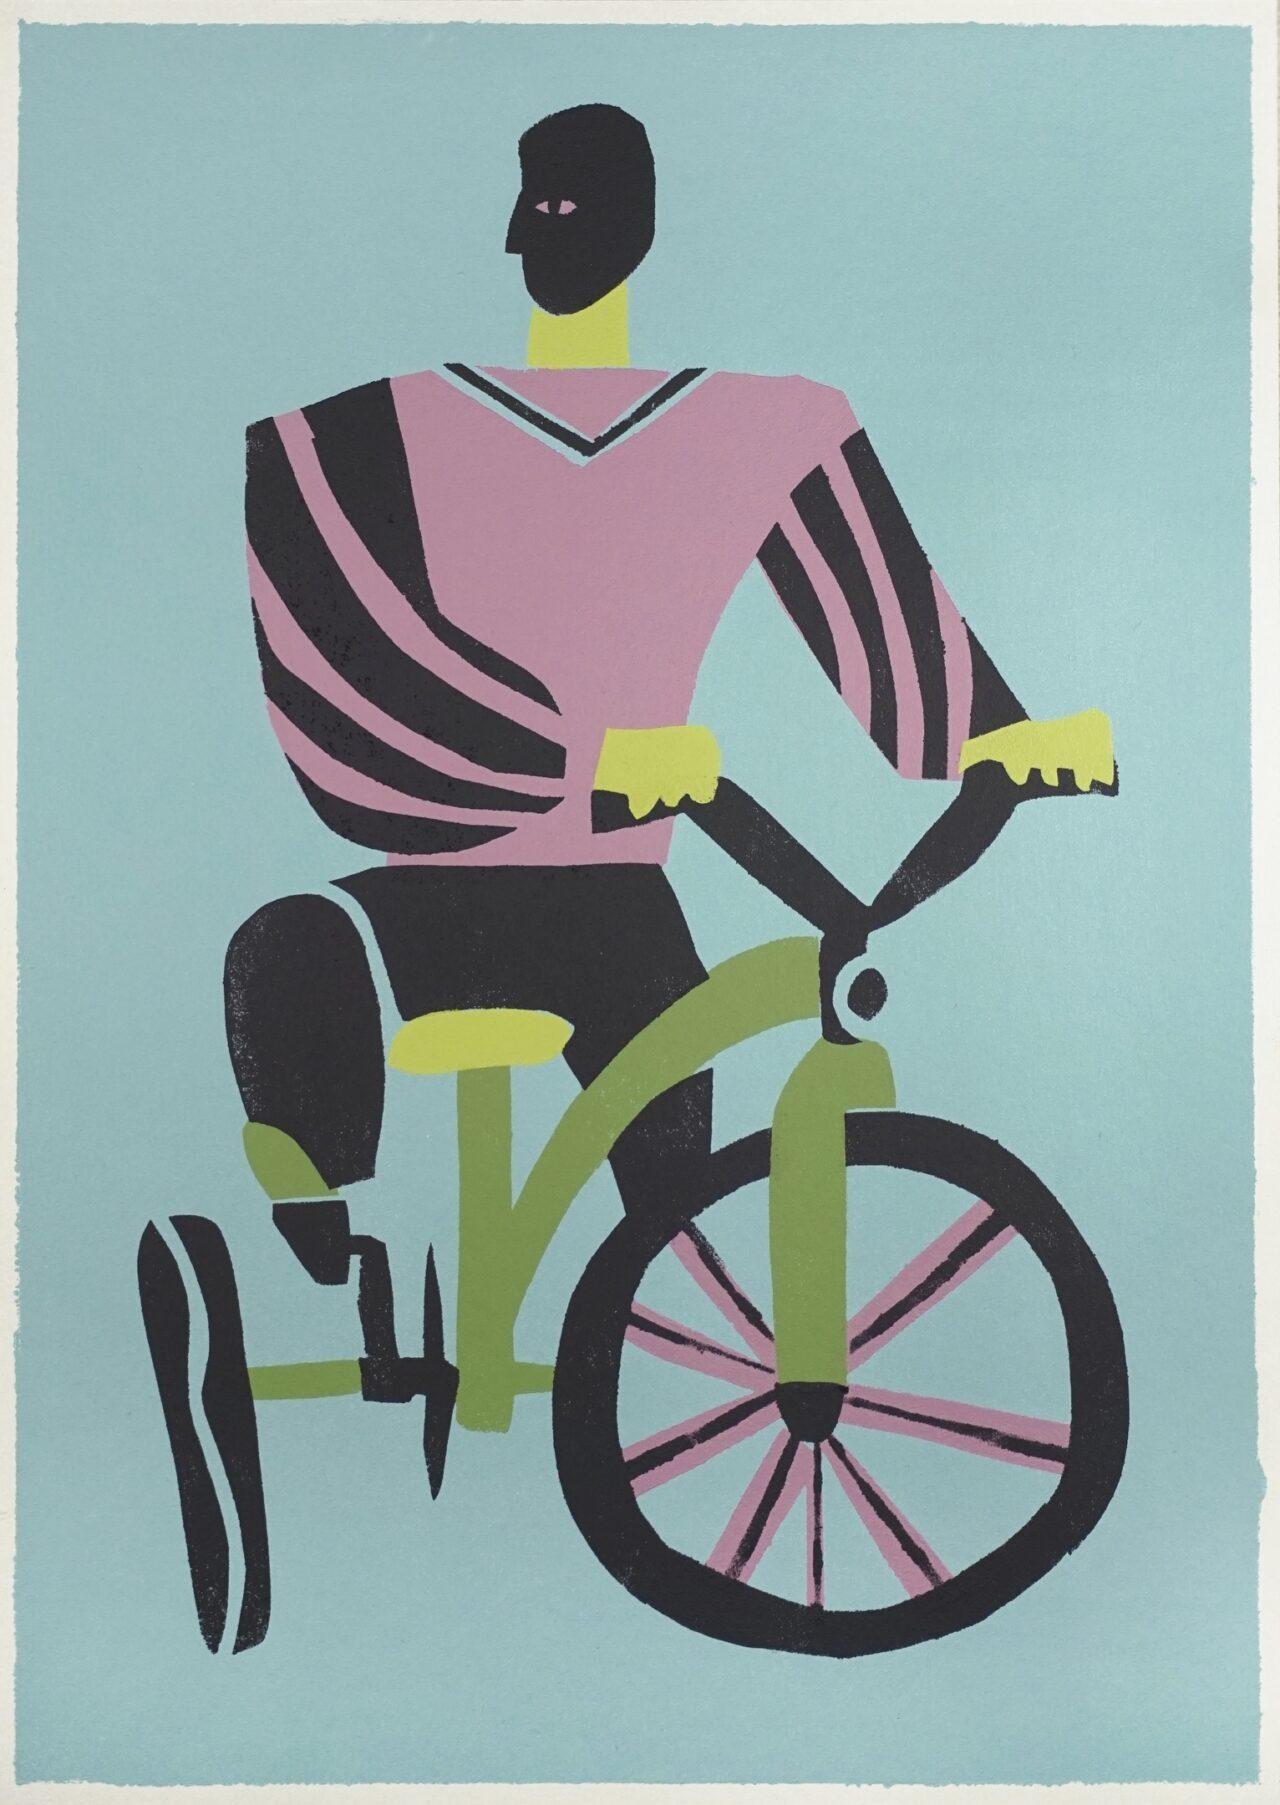 Александр Бирук. Велосипед. 2020. Бумага, акрил, техника ручной трафаретной печати. 30 х 42 см.